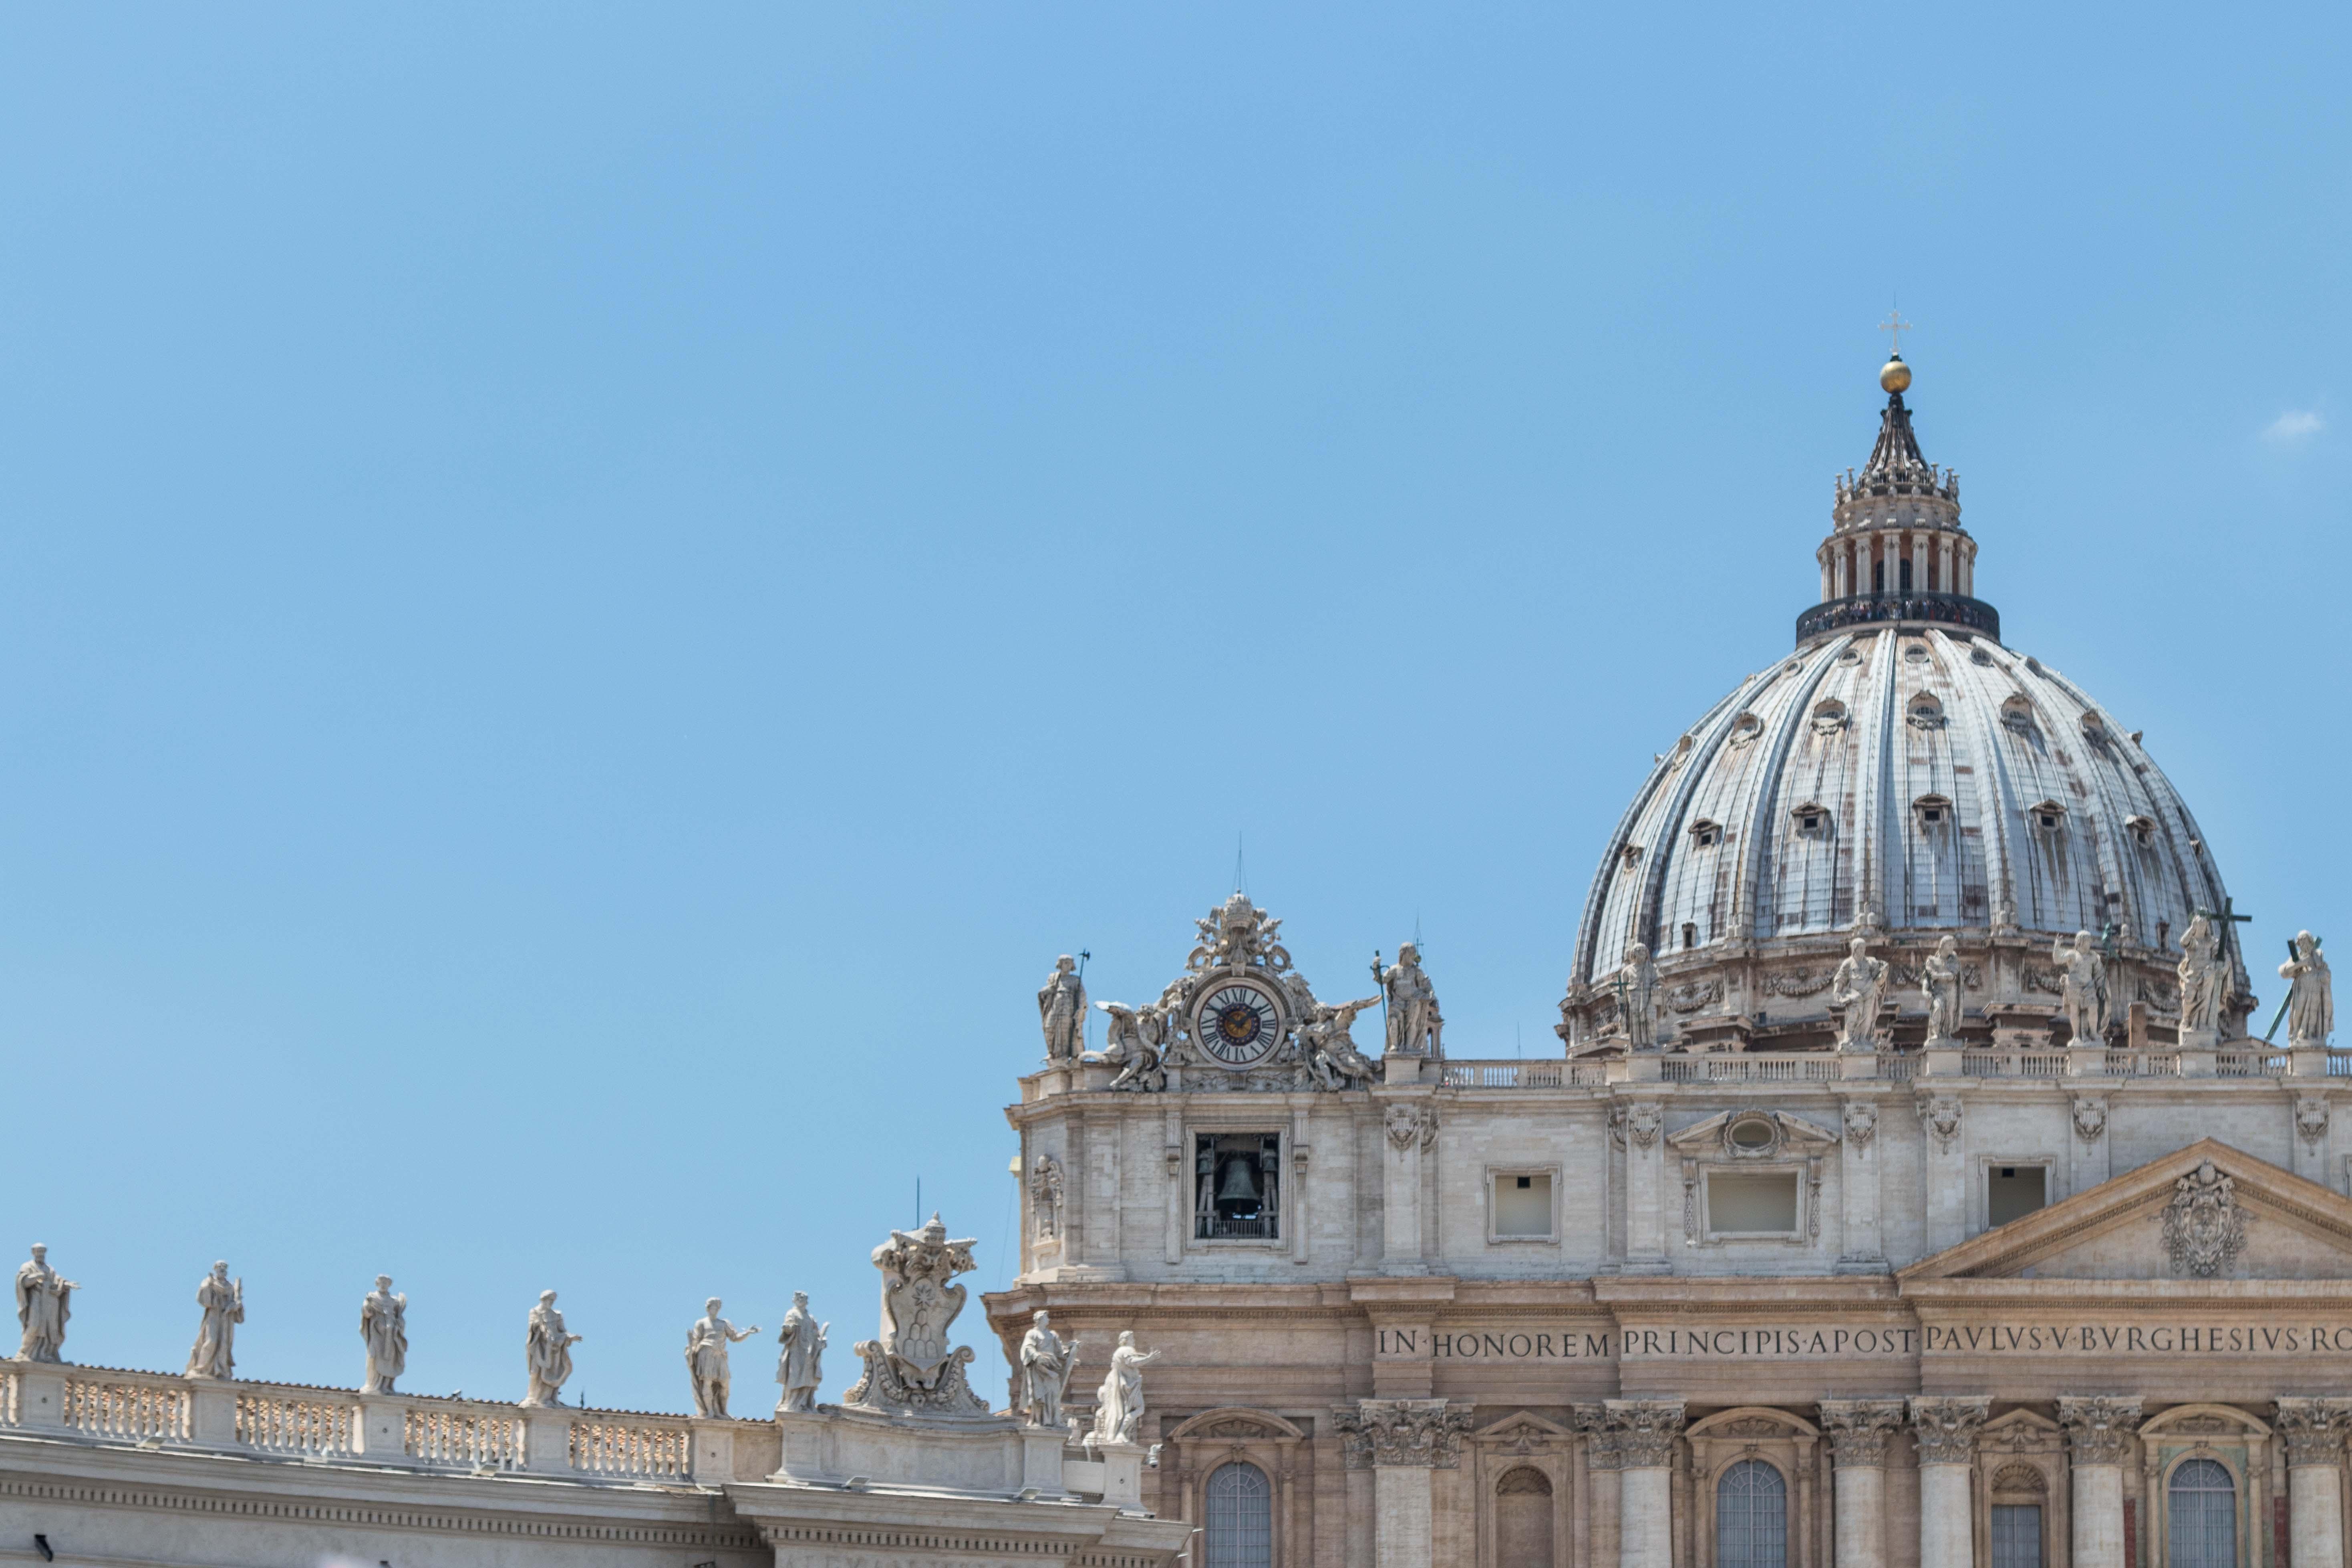 Vatican City | https://www.roseclearfield.com